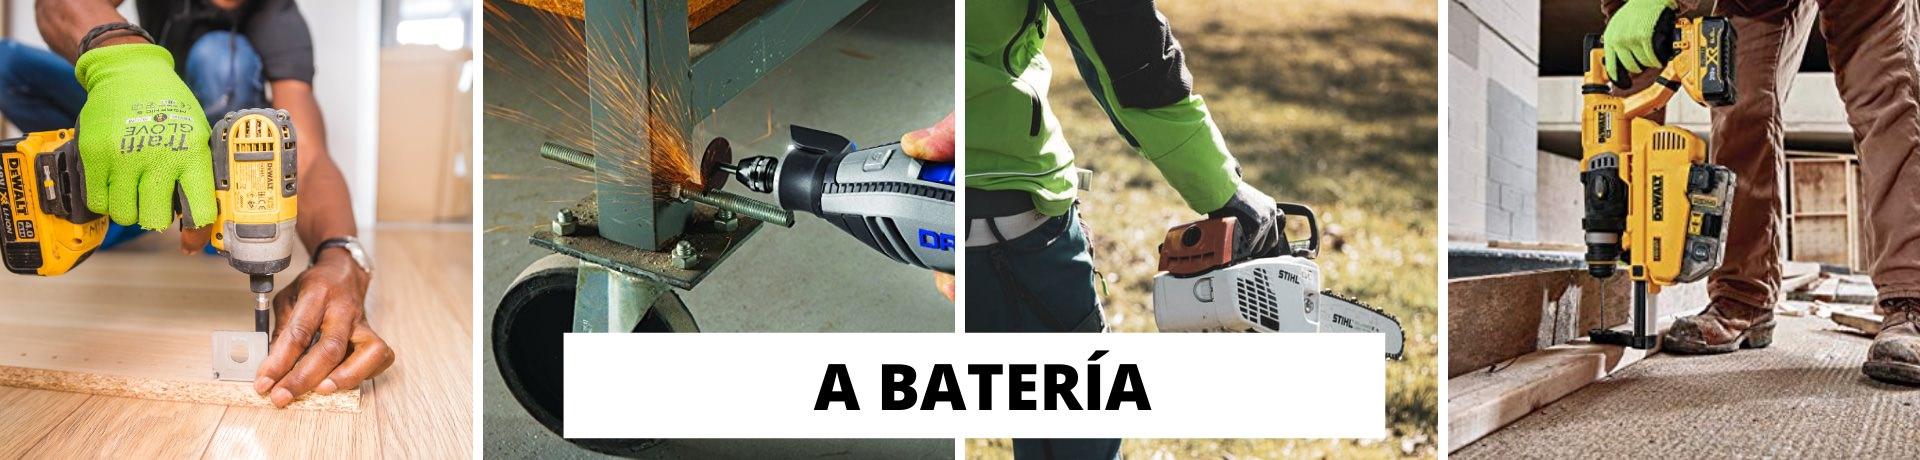 catalog/banner/herramientas-electricas-FullCompras.jpg